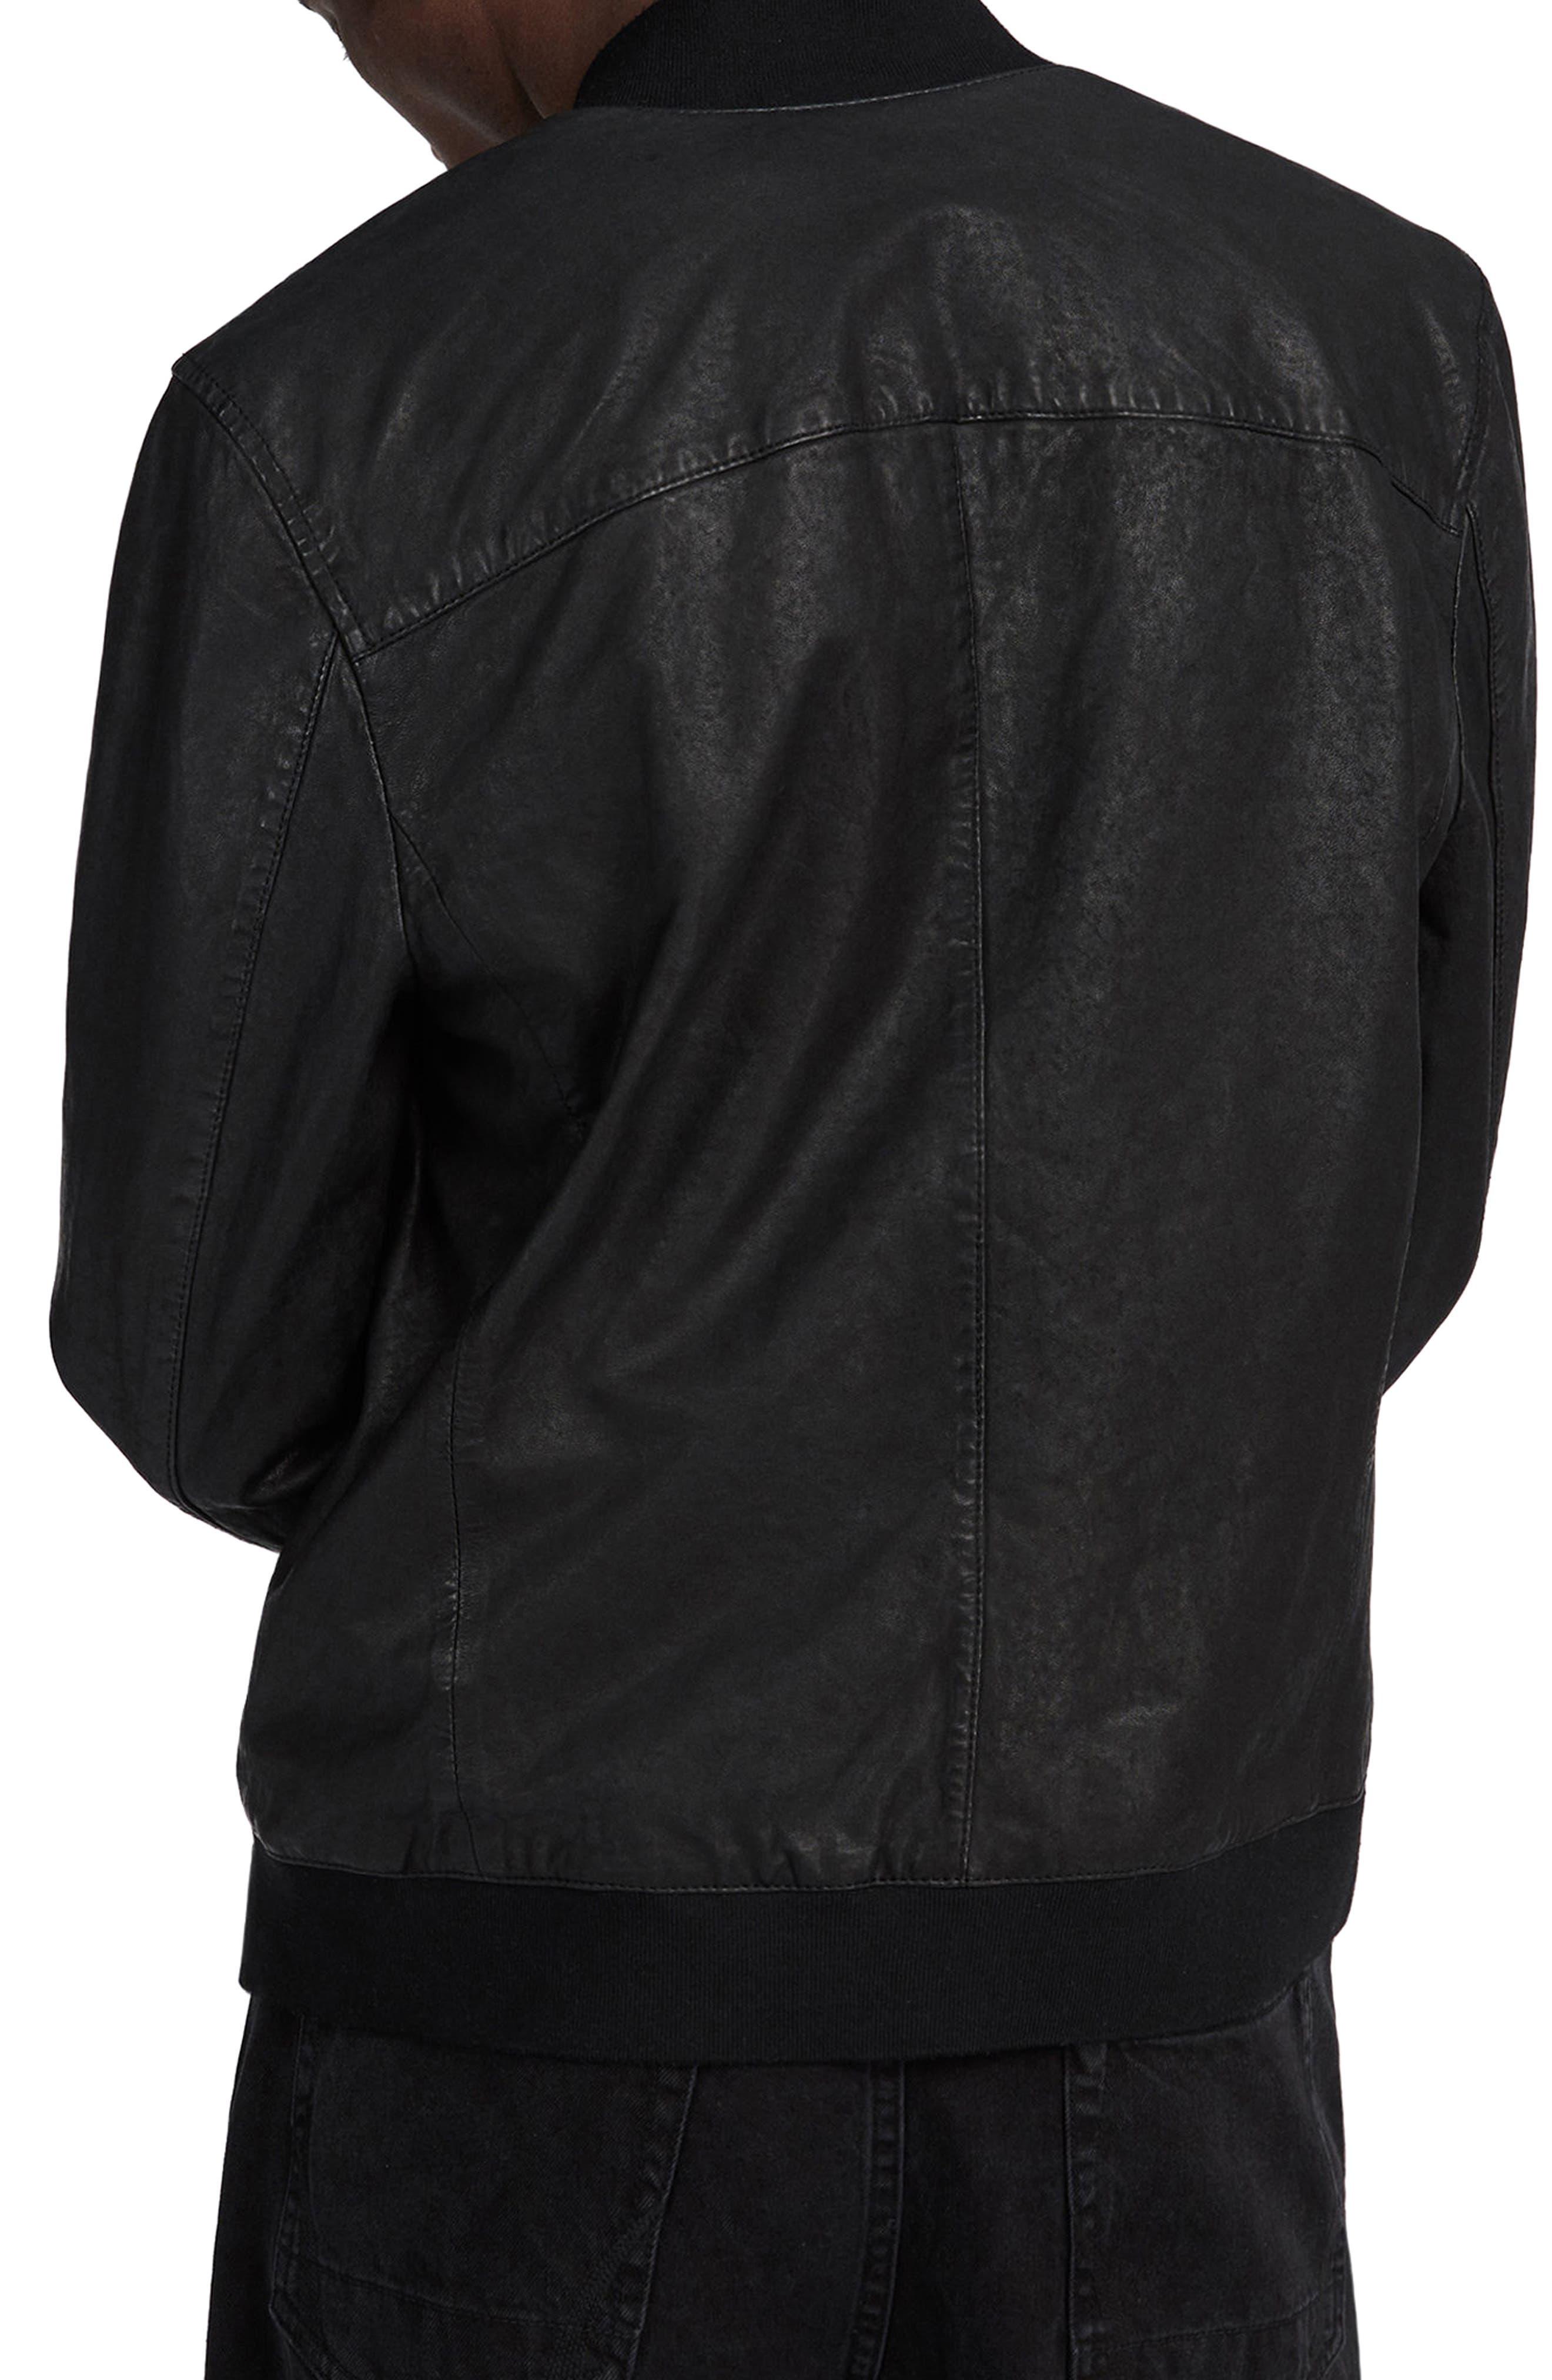 Kino Leather Bomber Jacket,                             Alternate thumbnail 2, color,                             001